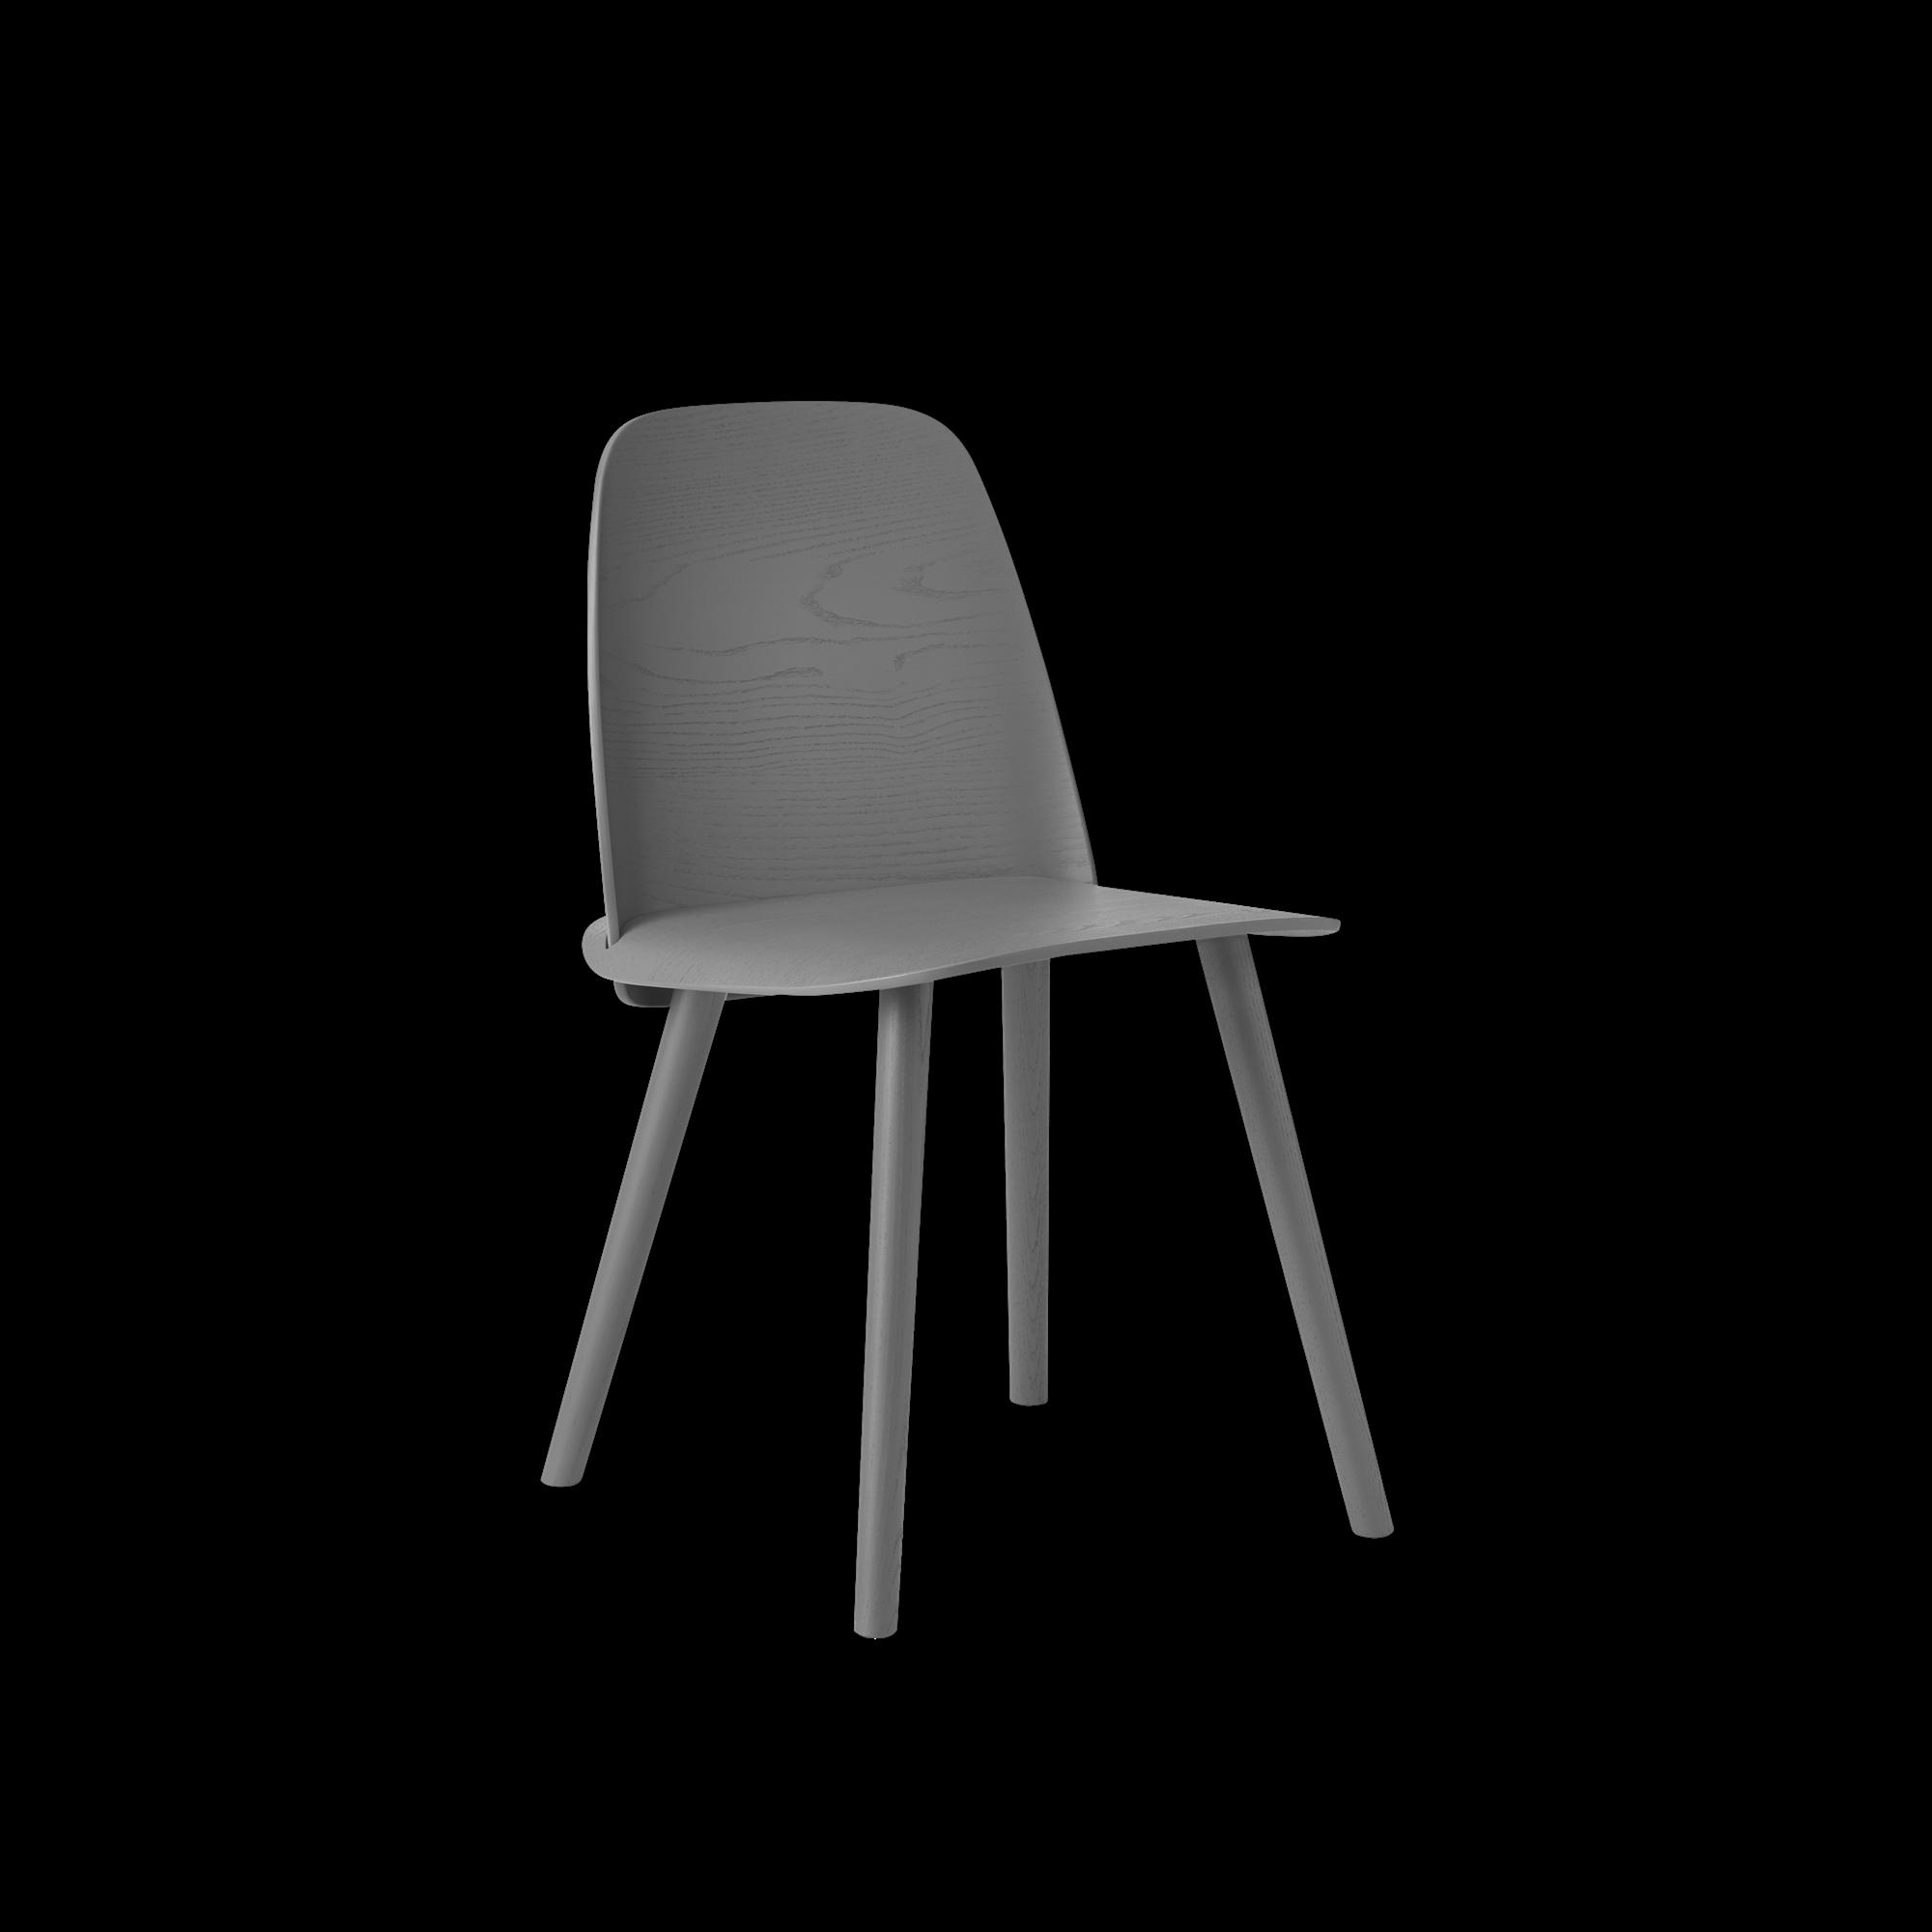 21408-nerd-chair-dark-grey-1502453376-6529160.png